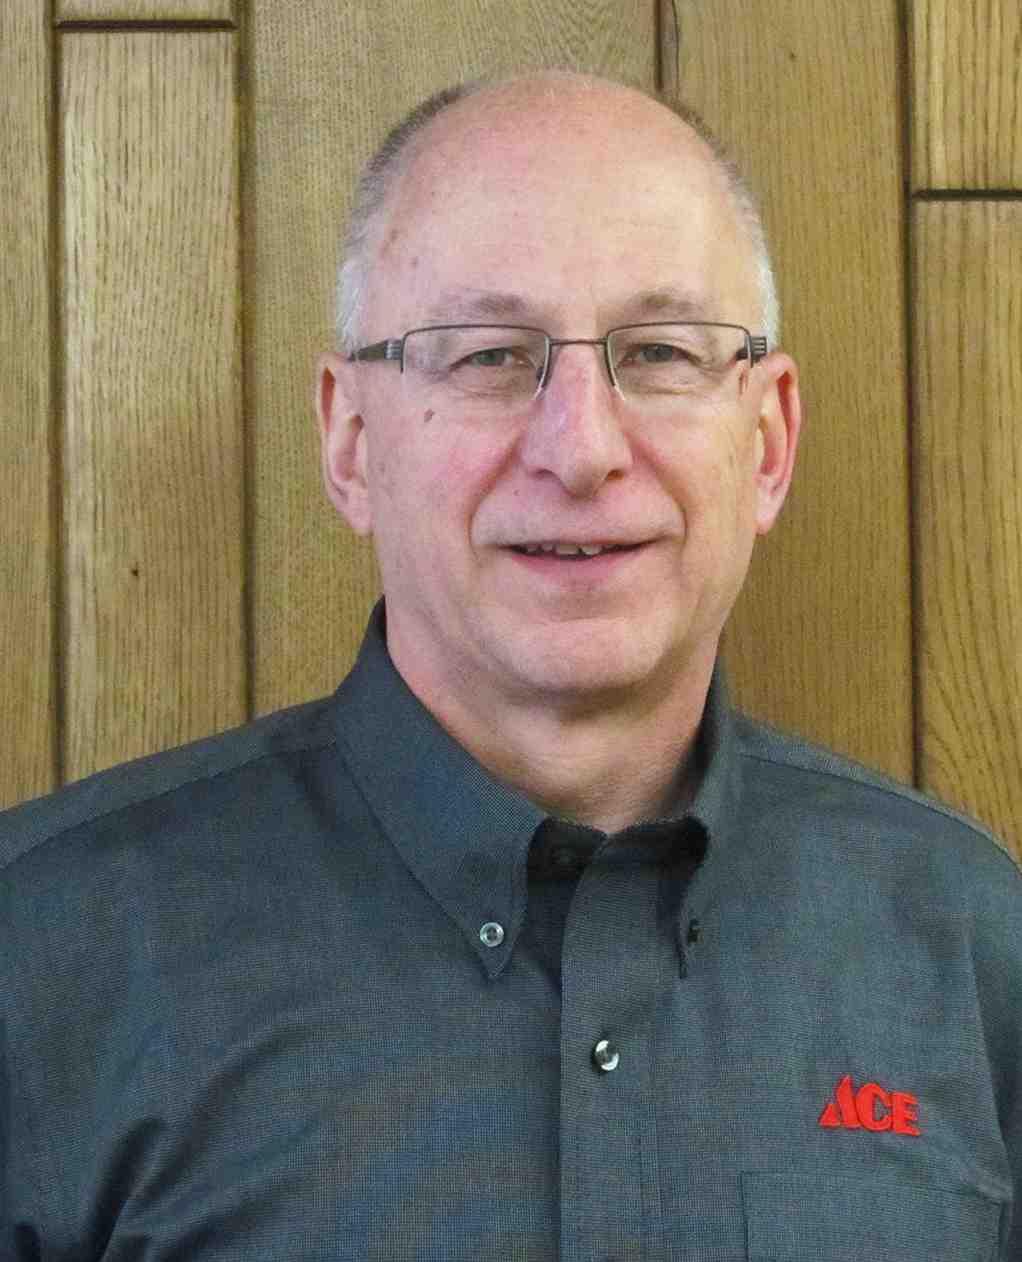 New ACO Inc. President Mark VandenBerg